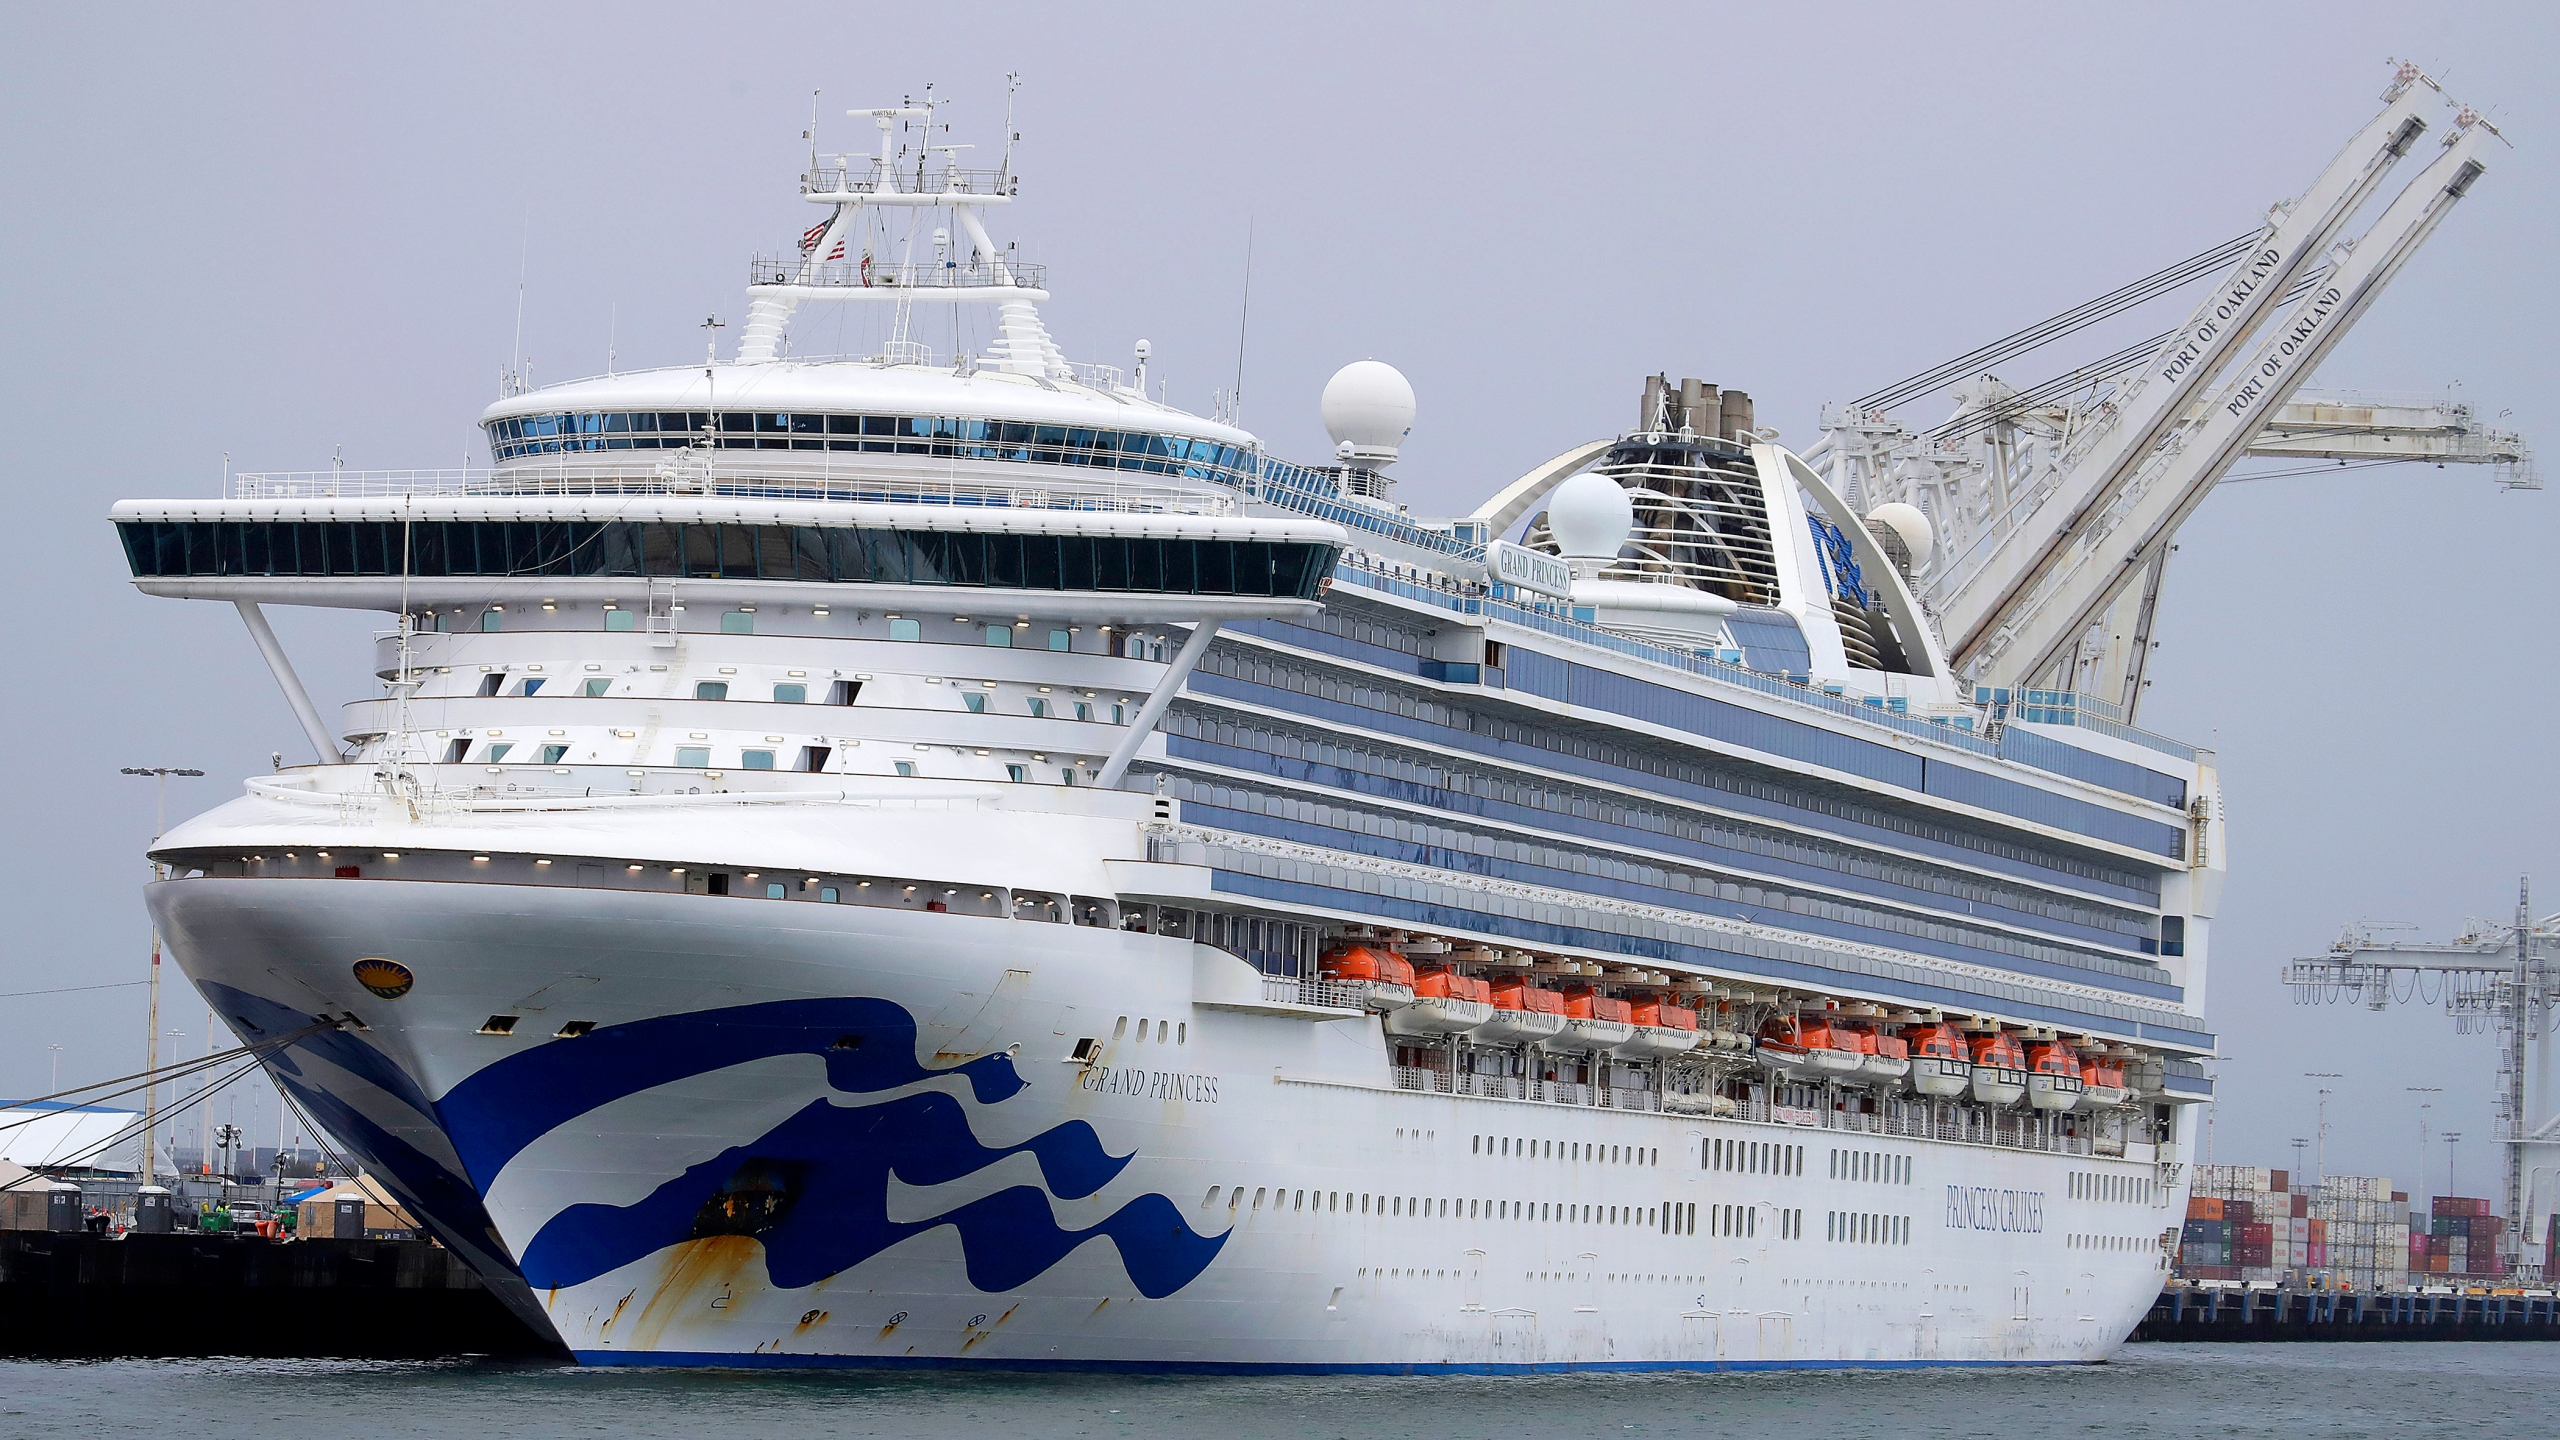 Grand Princess cruise ship